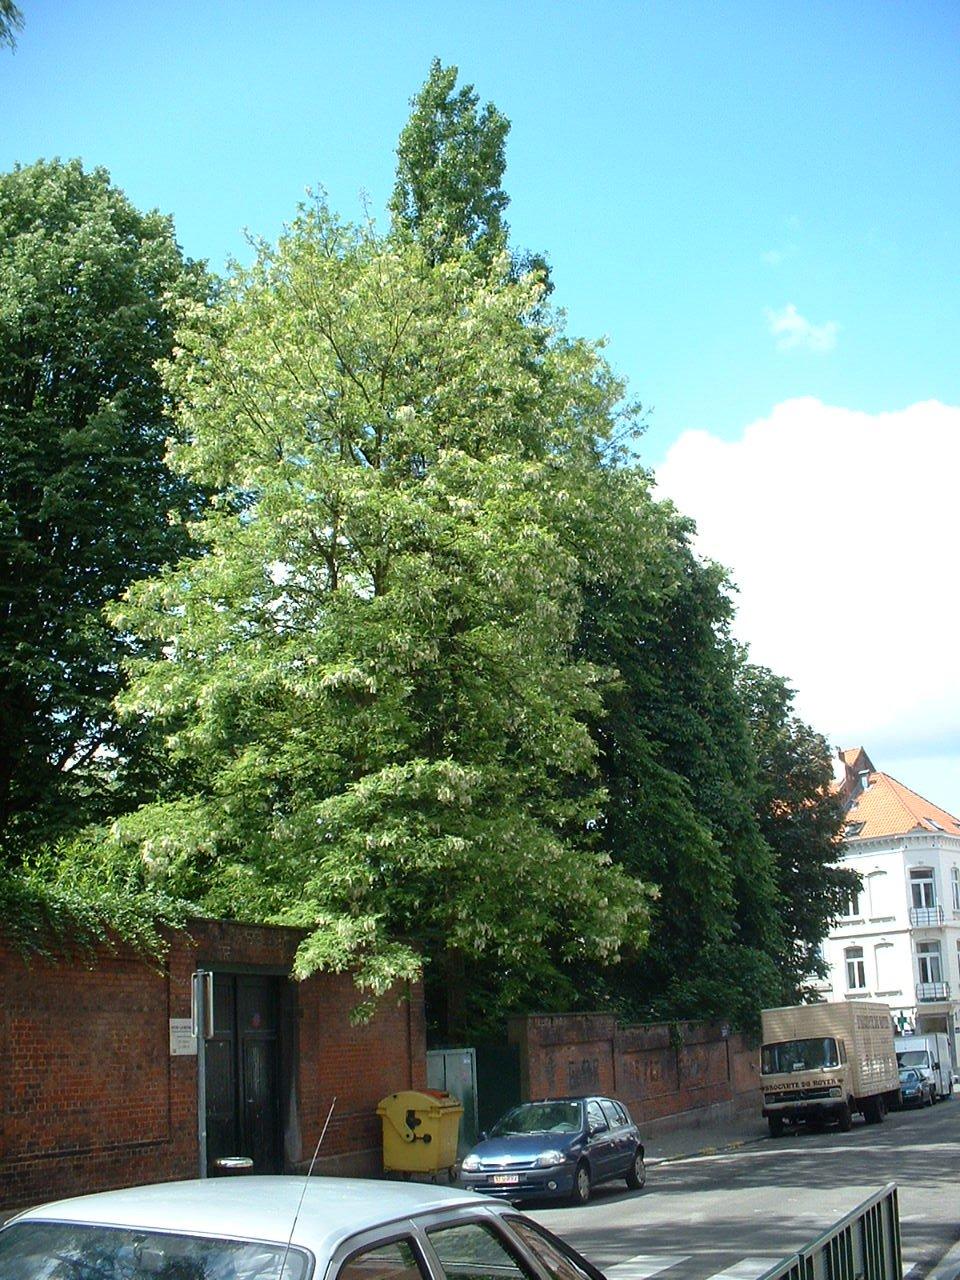 Gewone acacia – Brussel, Eedgenotenstraat, 70 –  27 Mei 2002